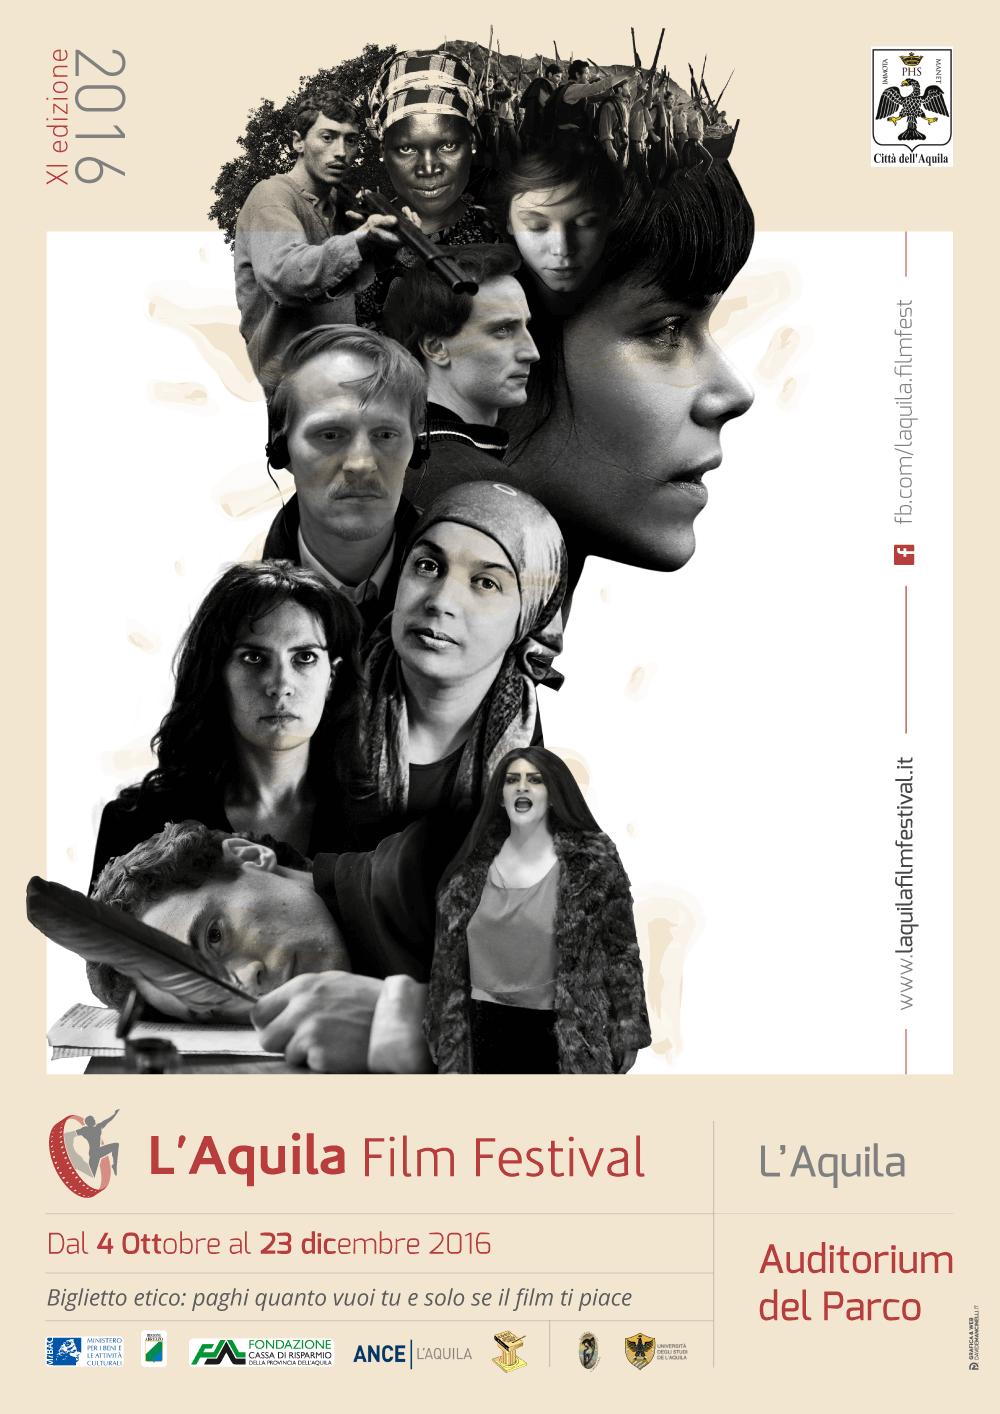 l'aquila film festival